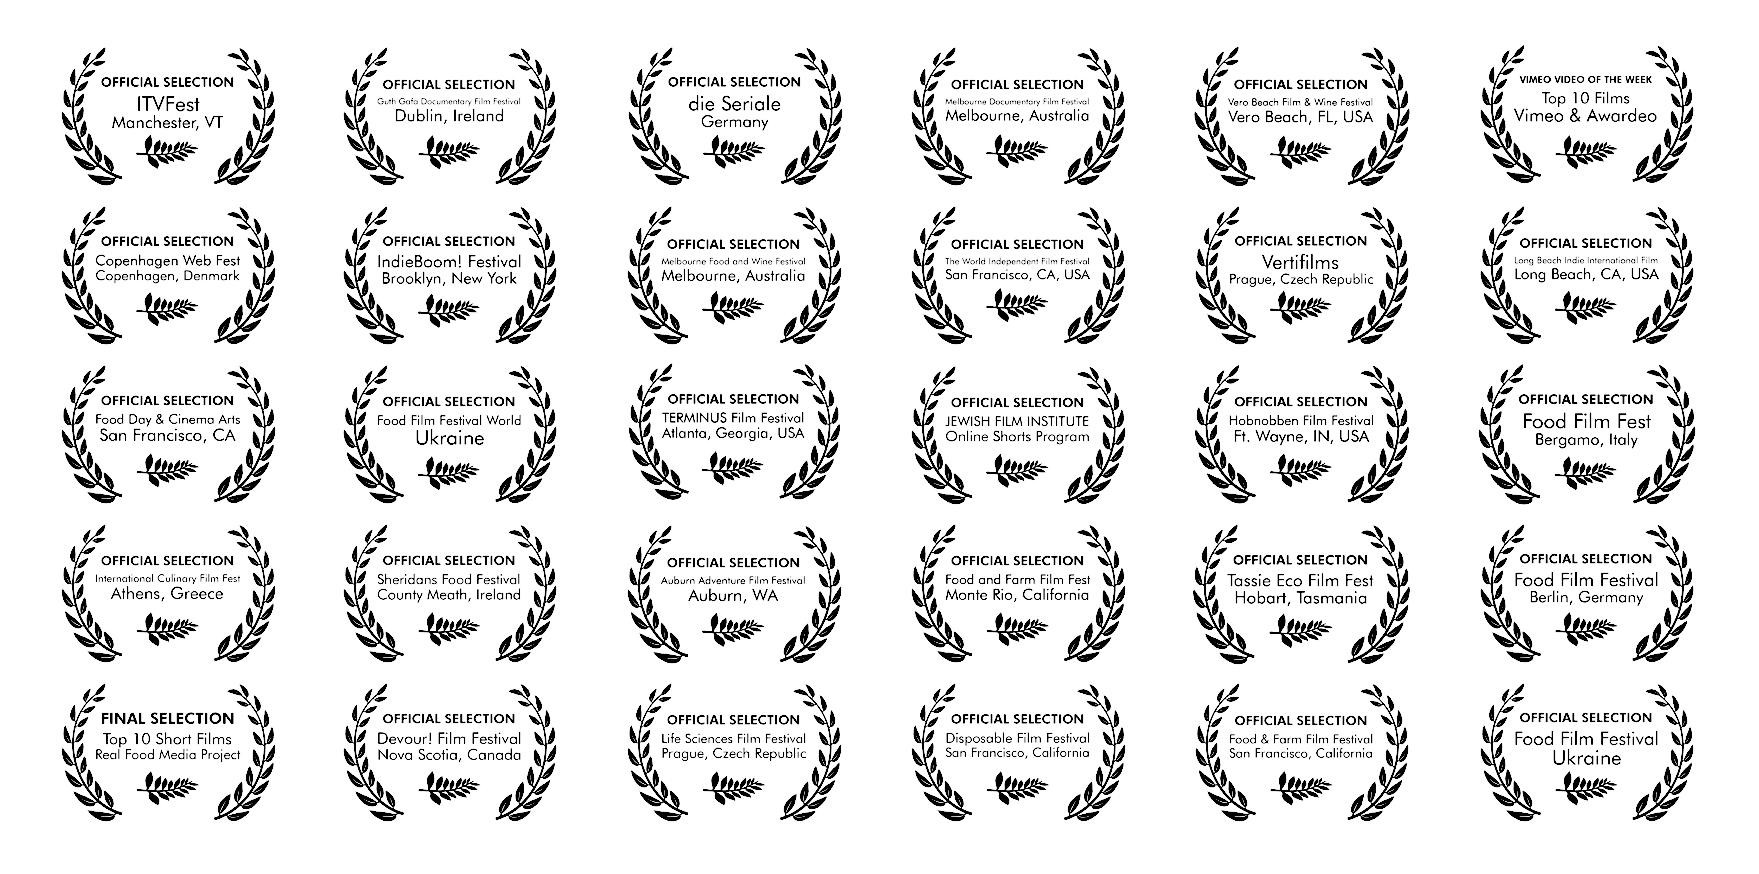 TASTE Award Laurels - 30 Laurels_Black_TransparentBG_02.jpeg